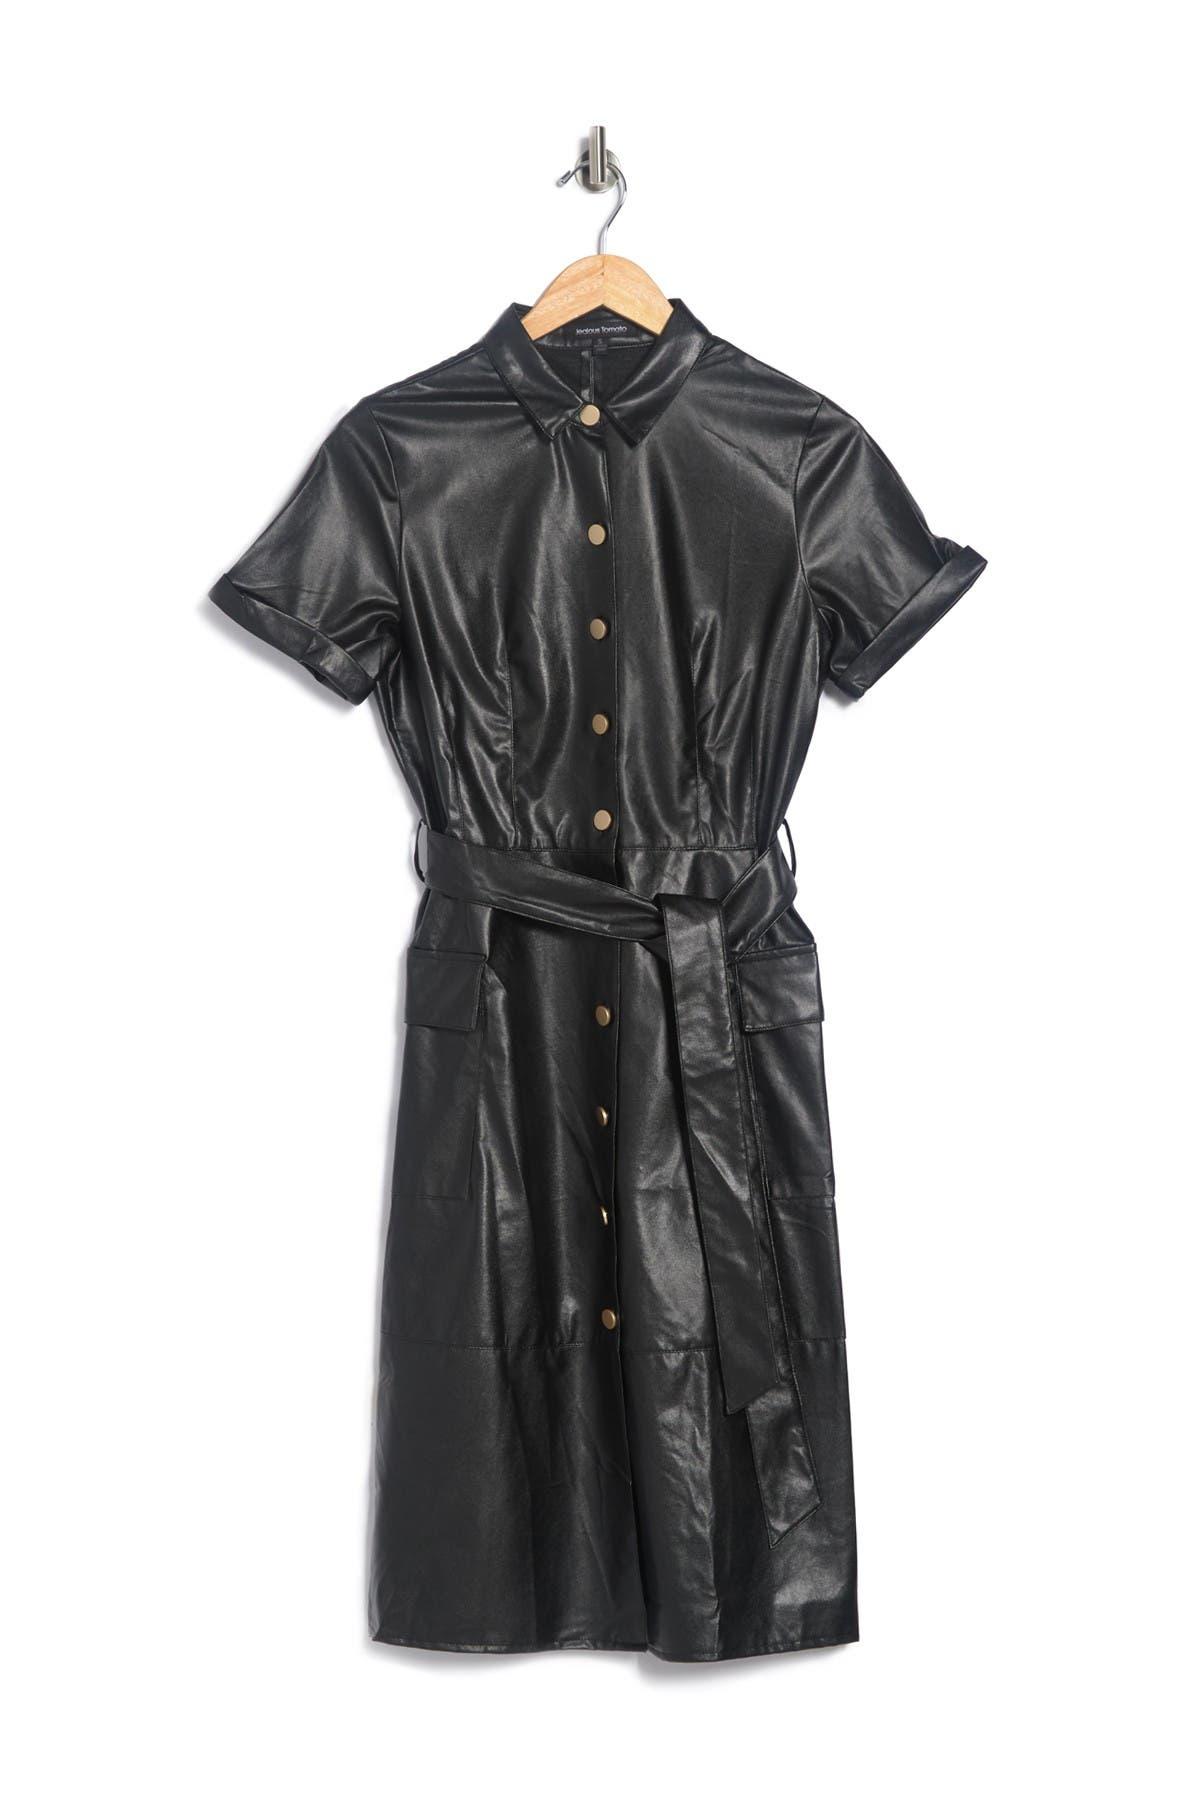 Image of Jealous Tomato Faux Leather Shirt Dress